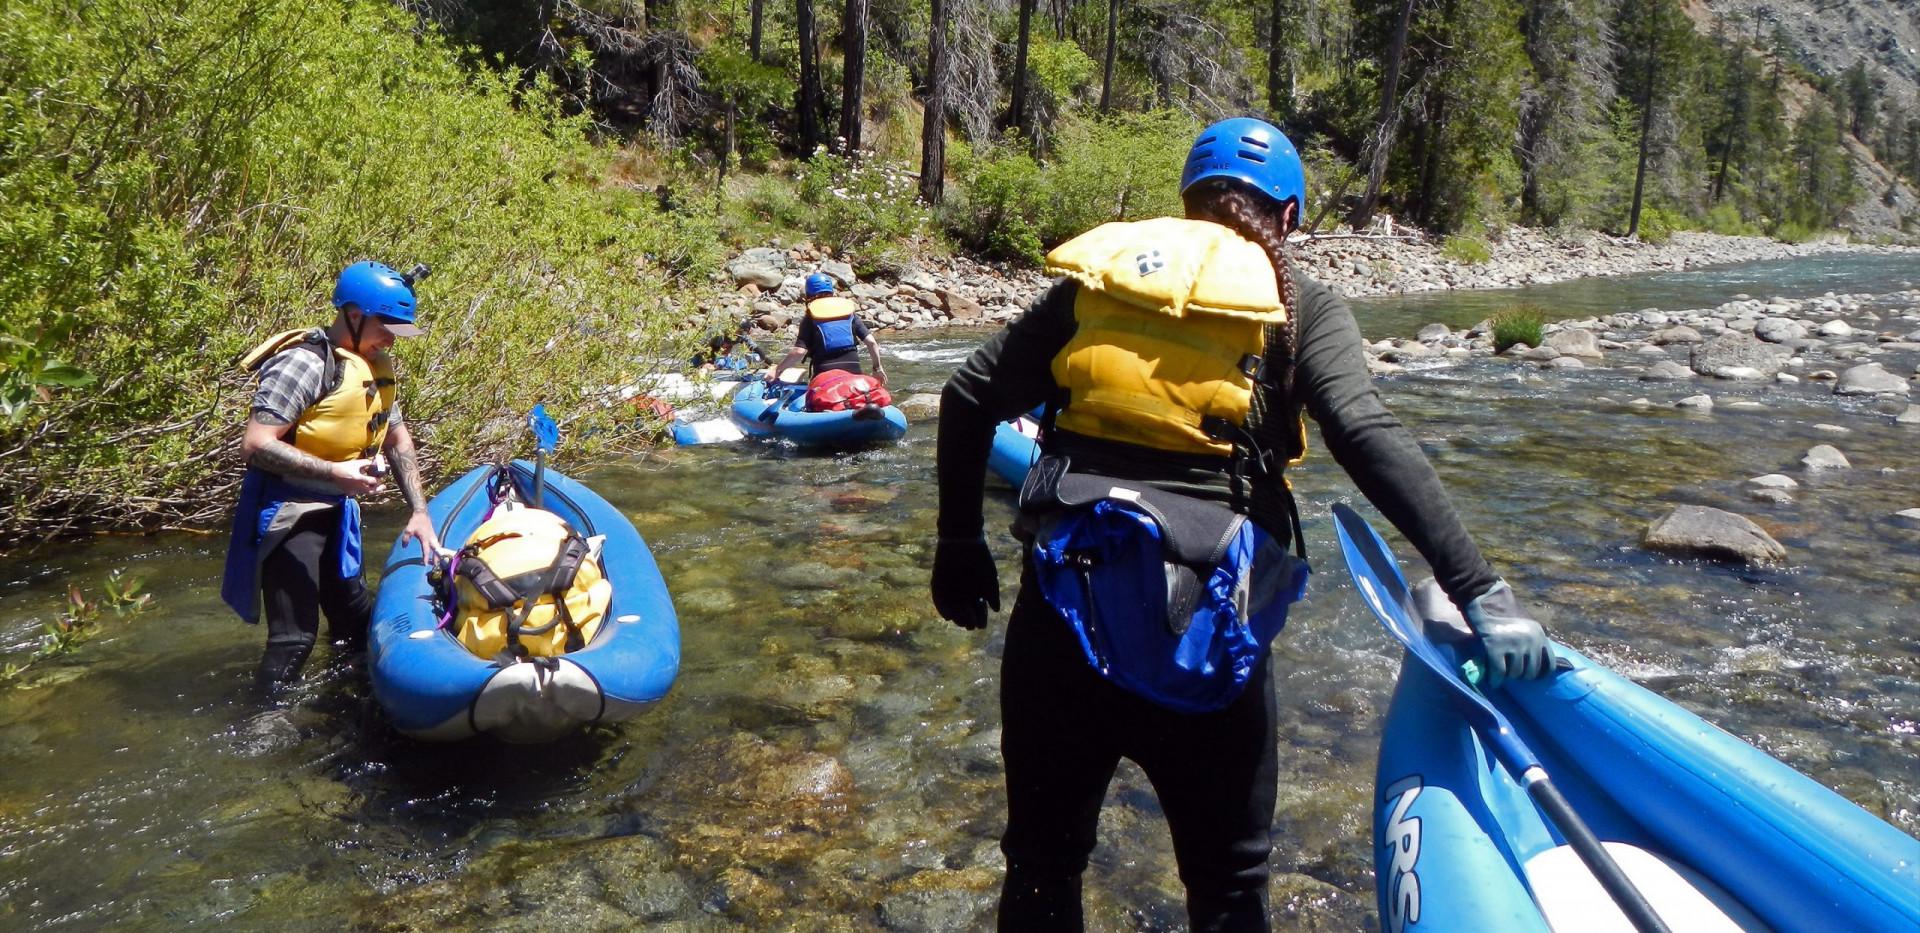 Smith River Kayaking - California